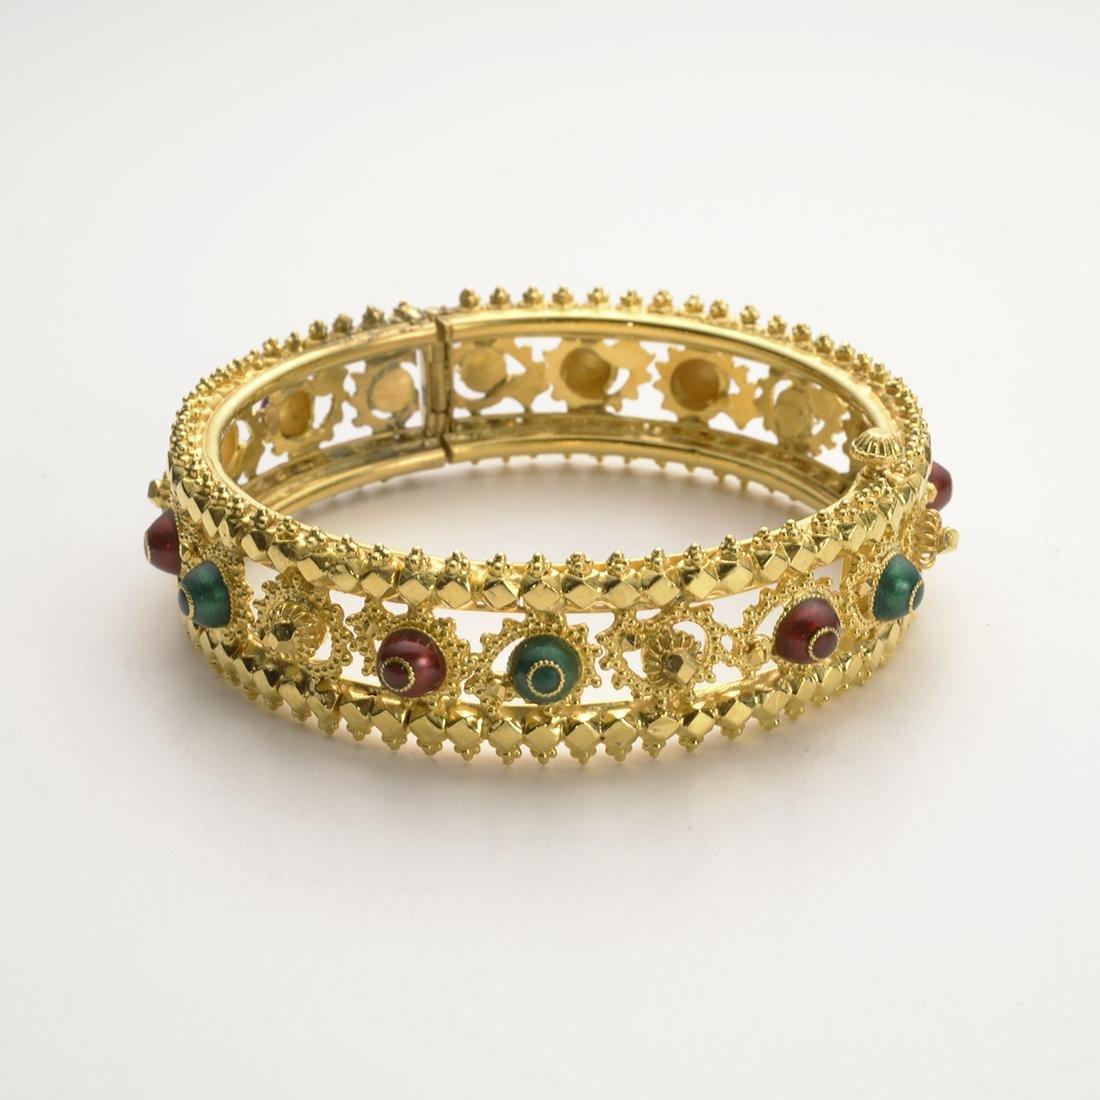 Tribhovanda Bhimji, 22 Carat Gold Bangle